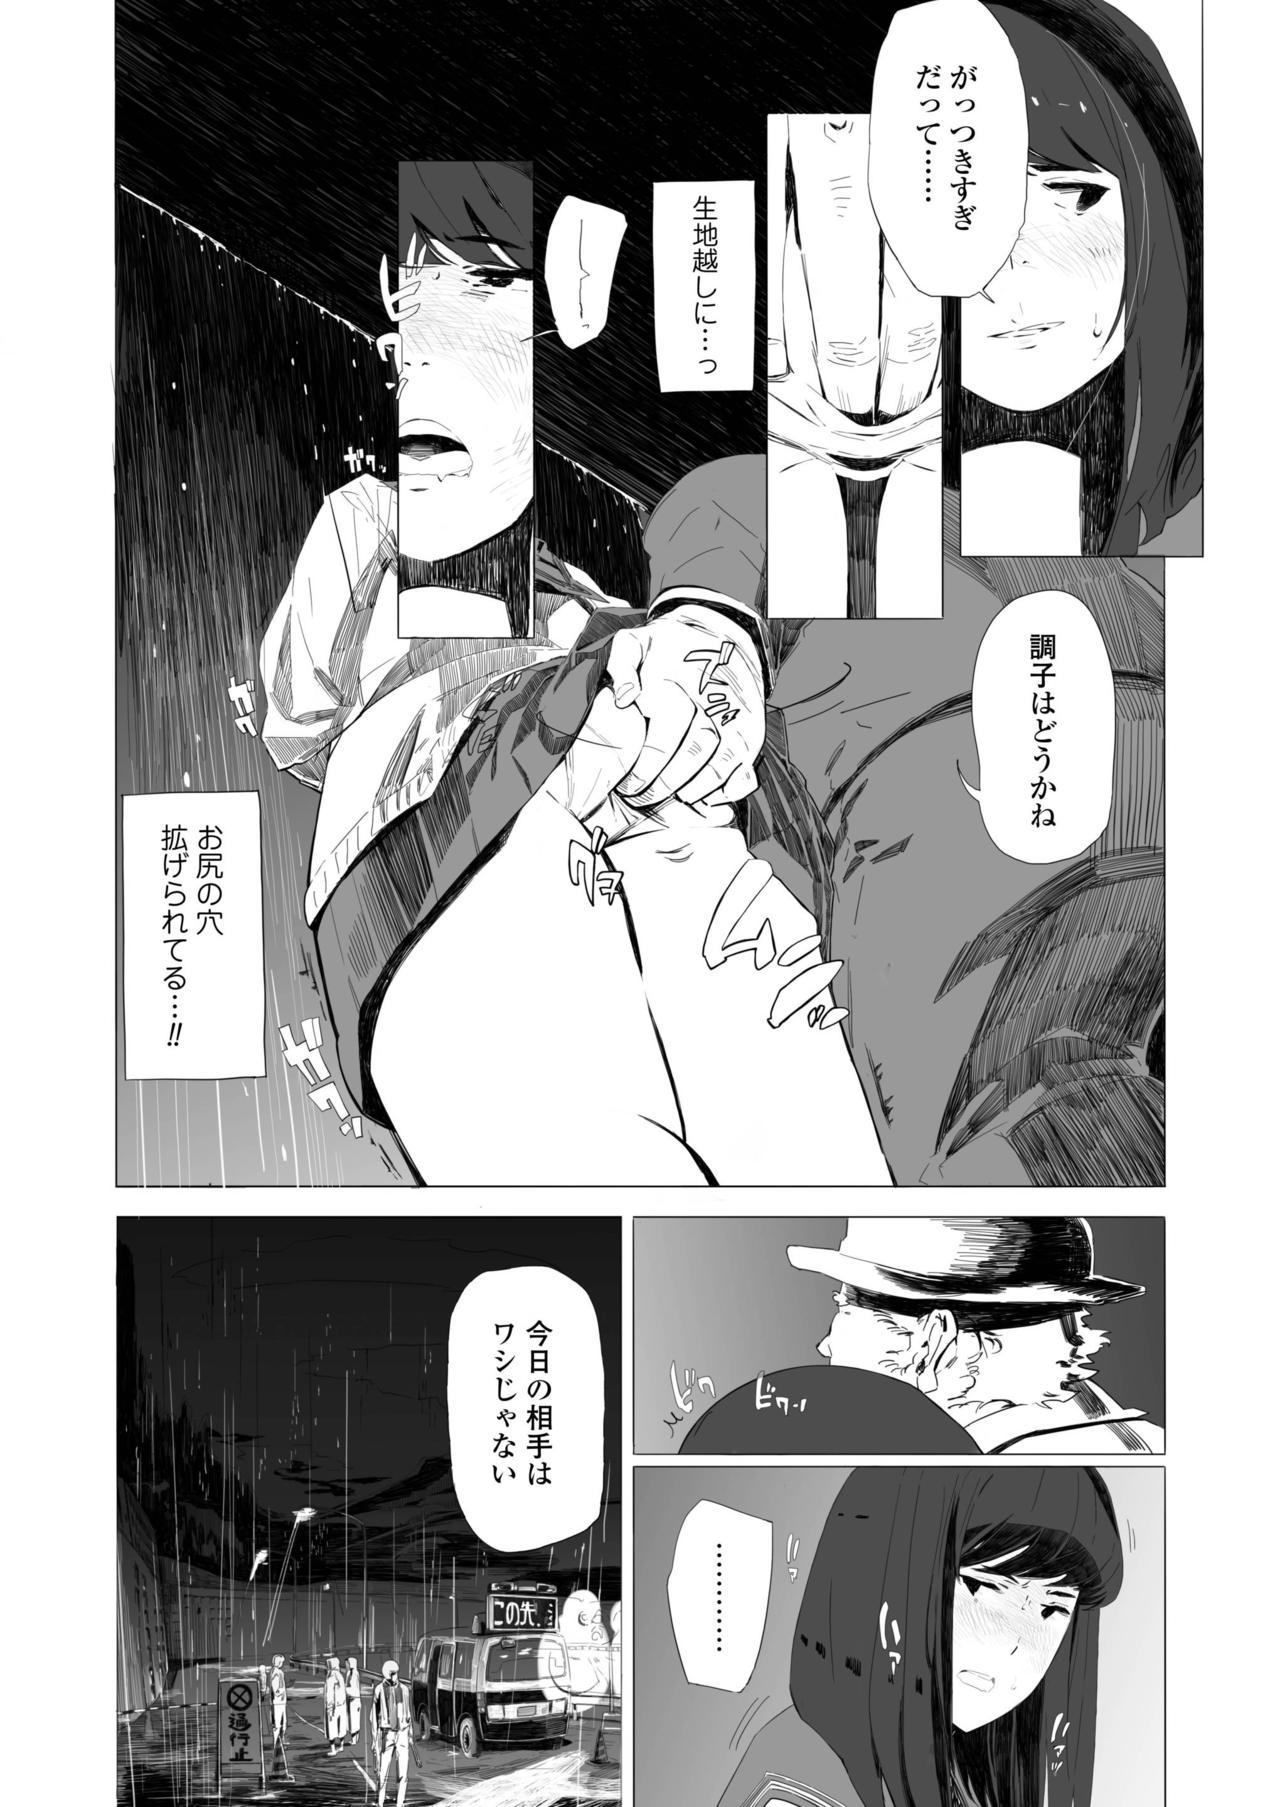 COMIC AOHA 2019 Haru 395